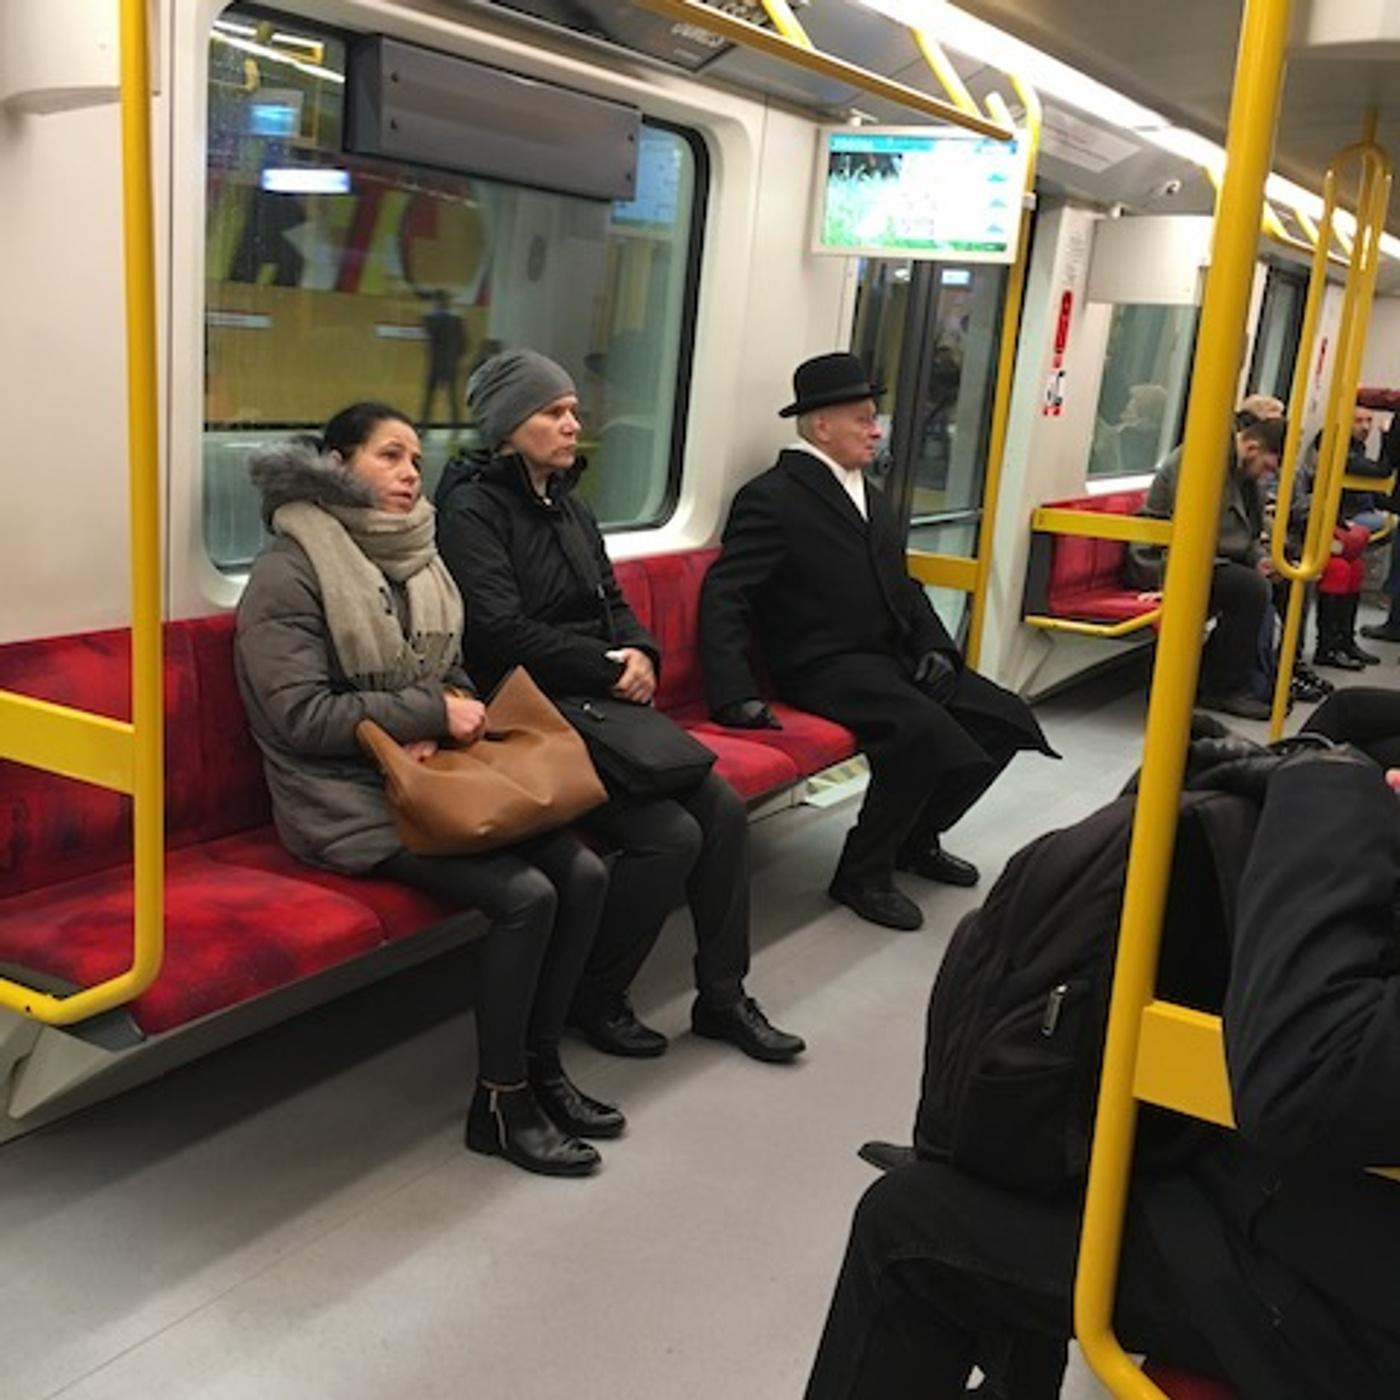 #47 Metro musings